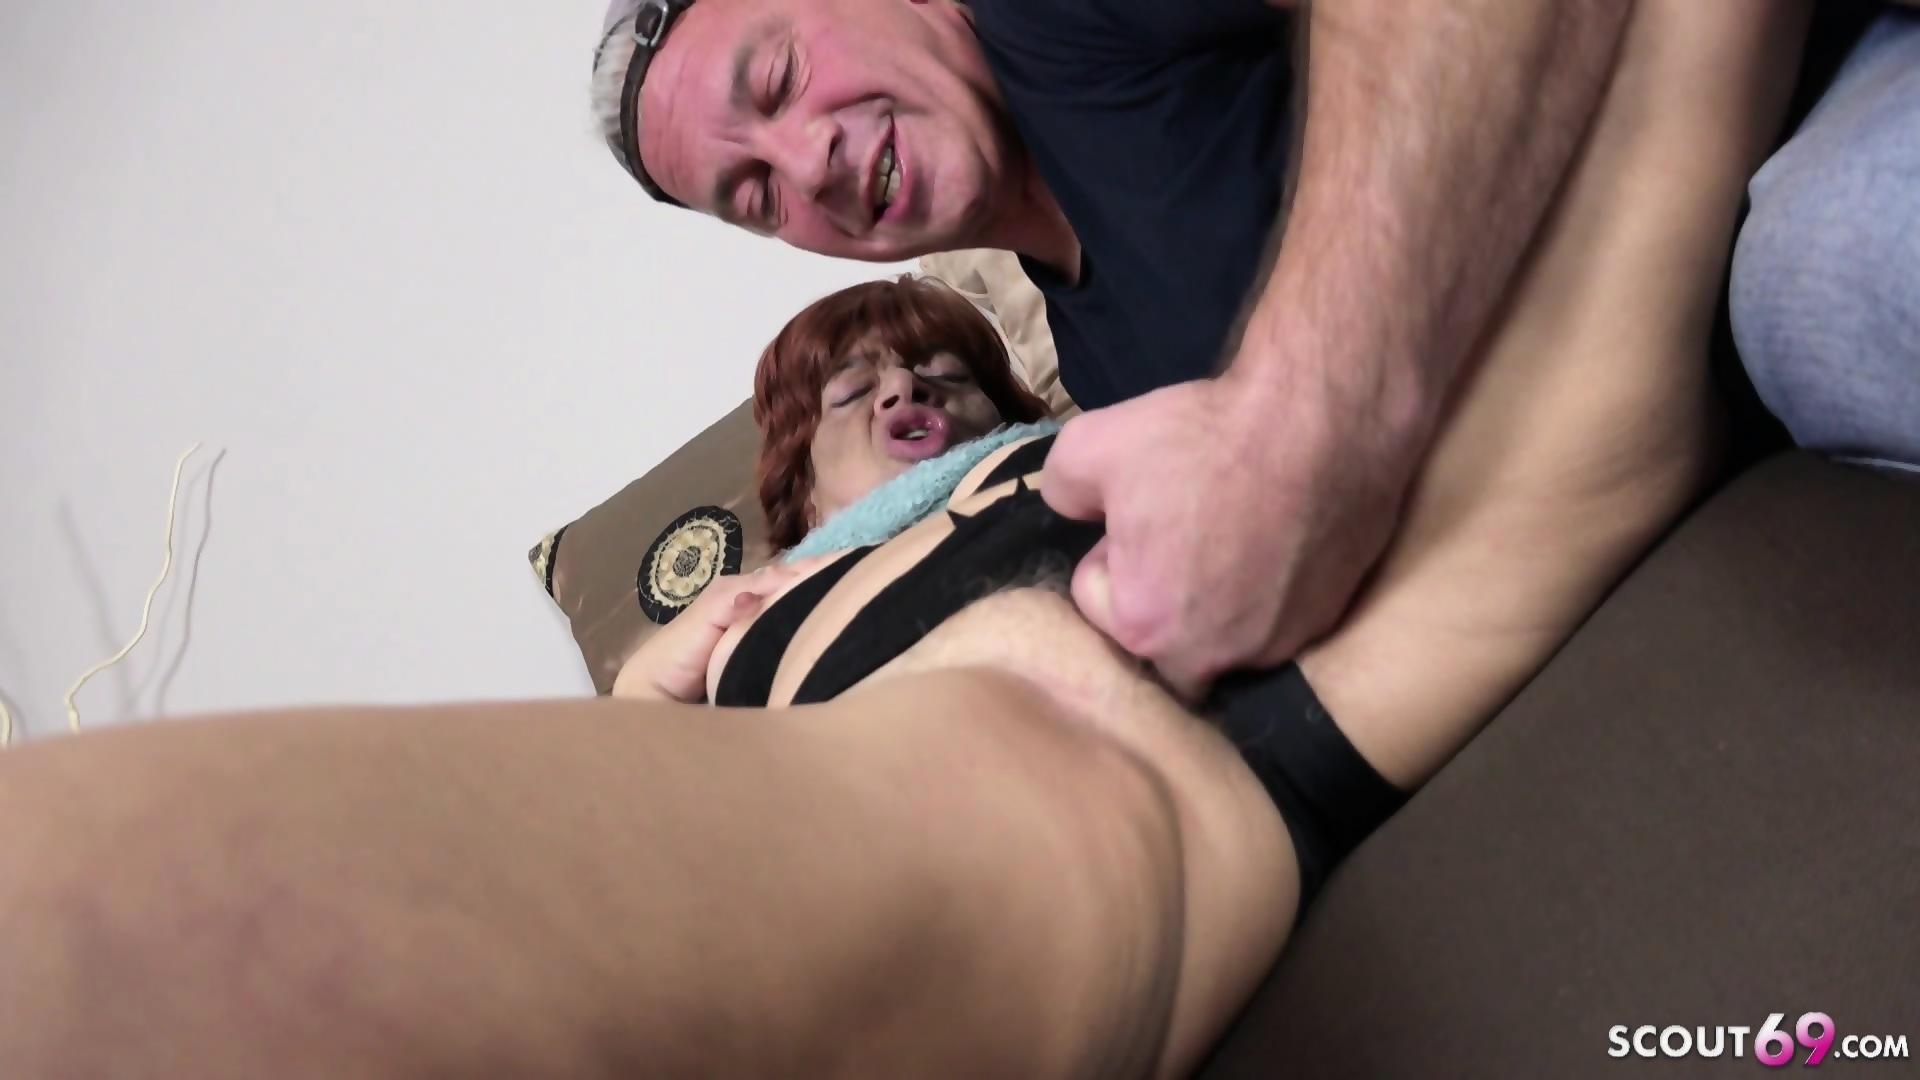 Hot chick with big dildo